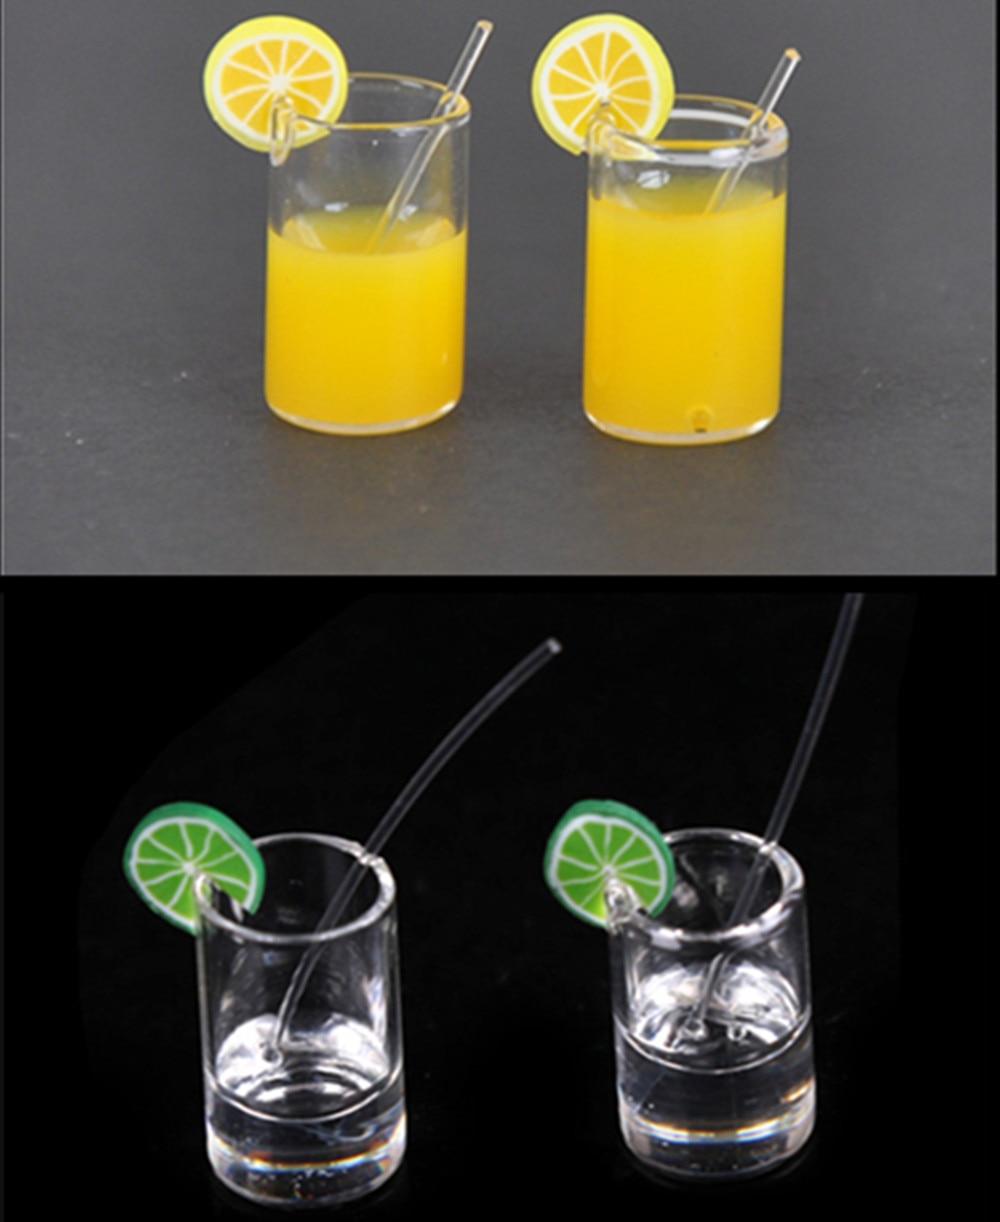 2PCS 1:12 Lemon Water Cups Dollhouse Accessories Miniature Toy Doll Food Kitchen